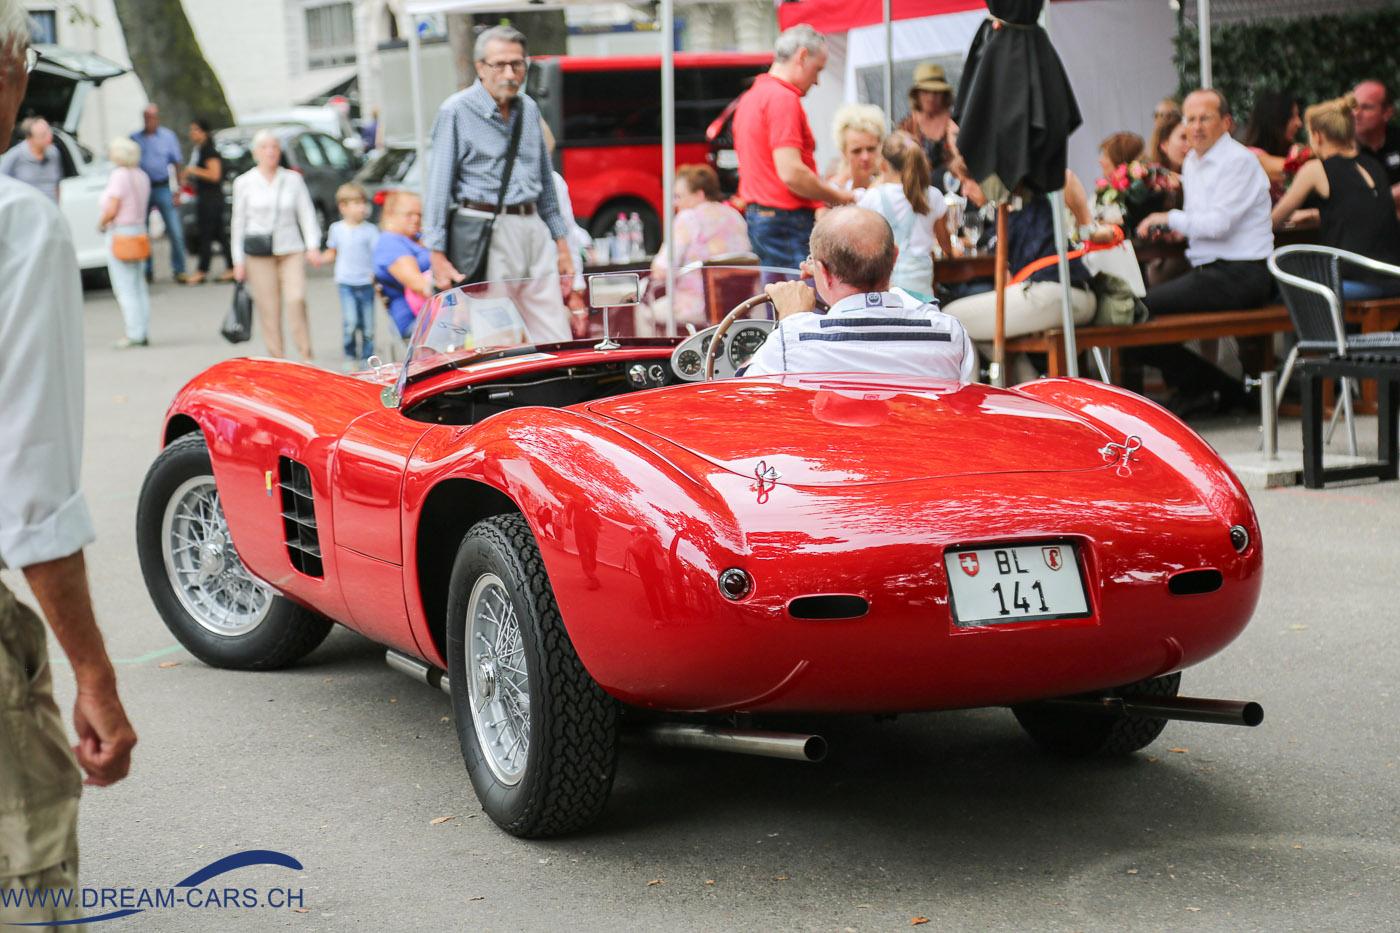 ZCCA Zurich Classic Car Award 2016. Der Ferrari 166 nach der Preisverleihung.